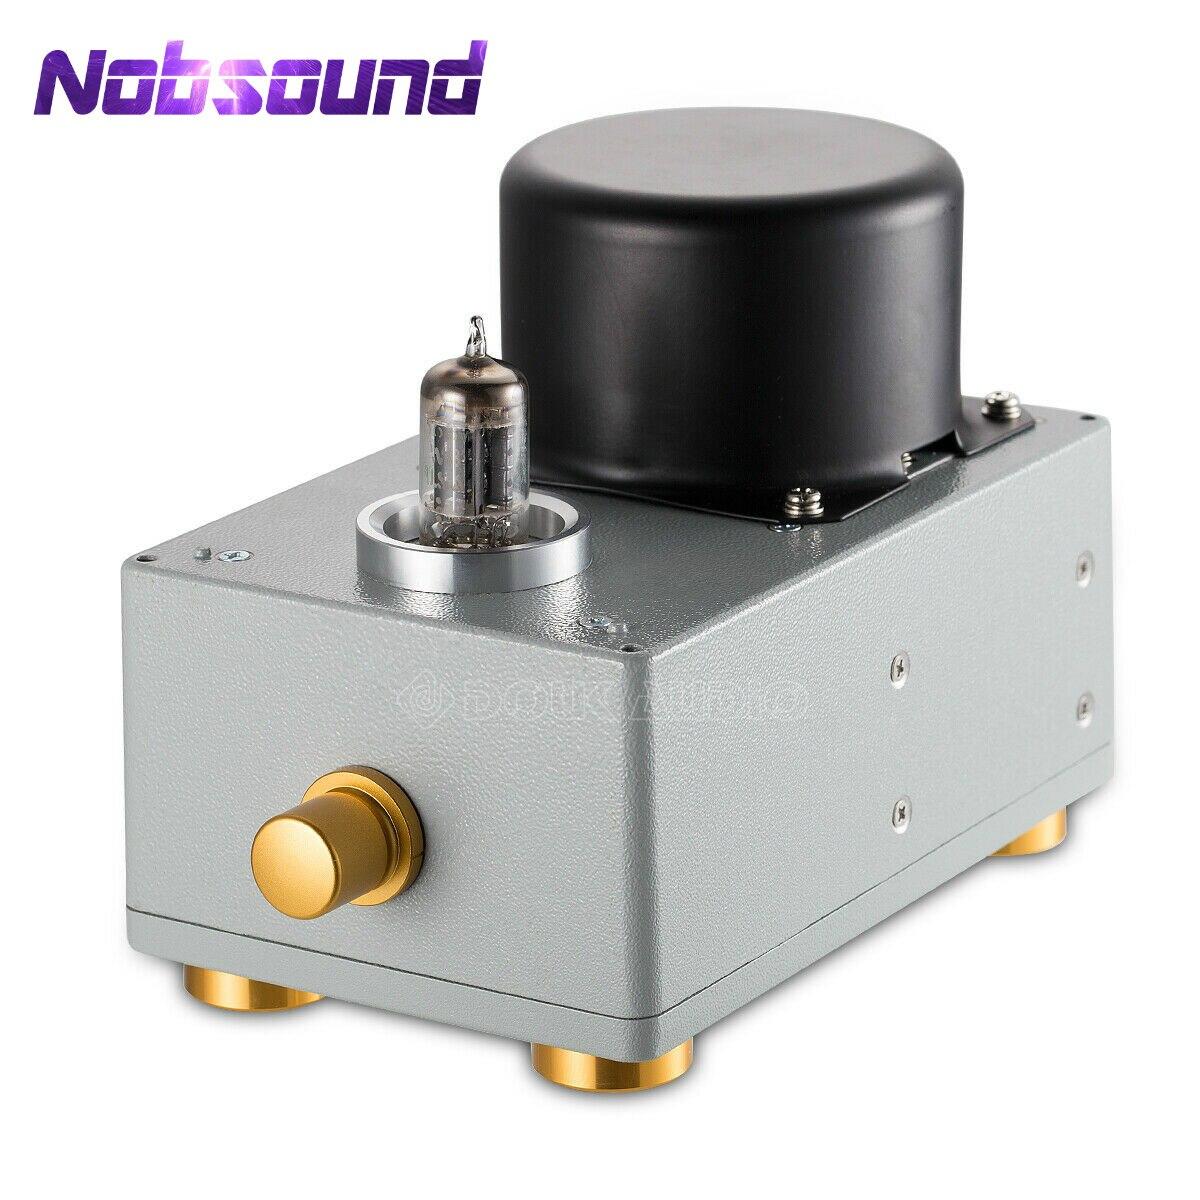 Nobsound Handmade Hi-Fi Stereo Vacuum Tube 5687 Pre-amplifier For CD Player Amplifier